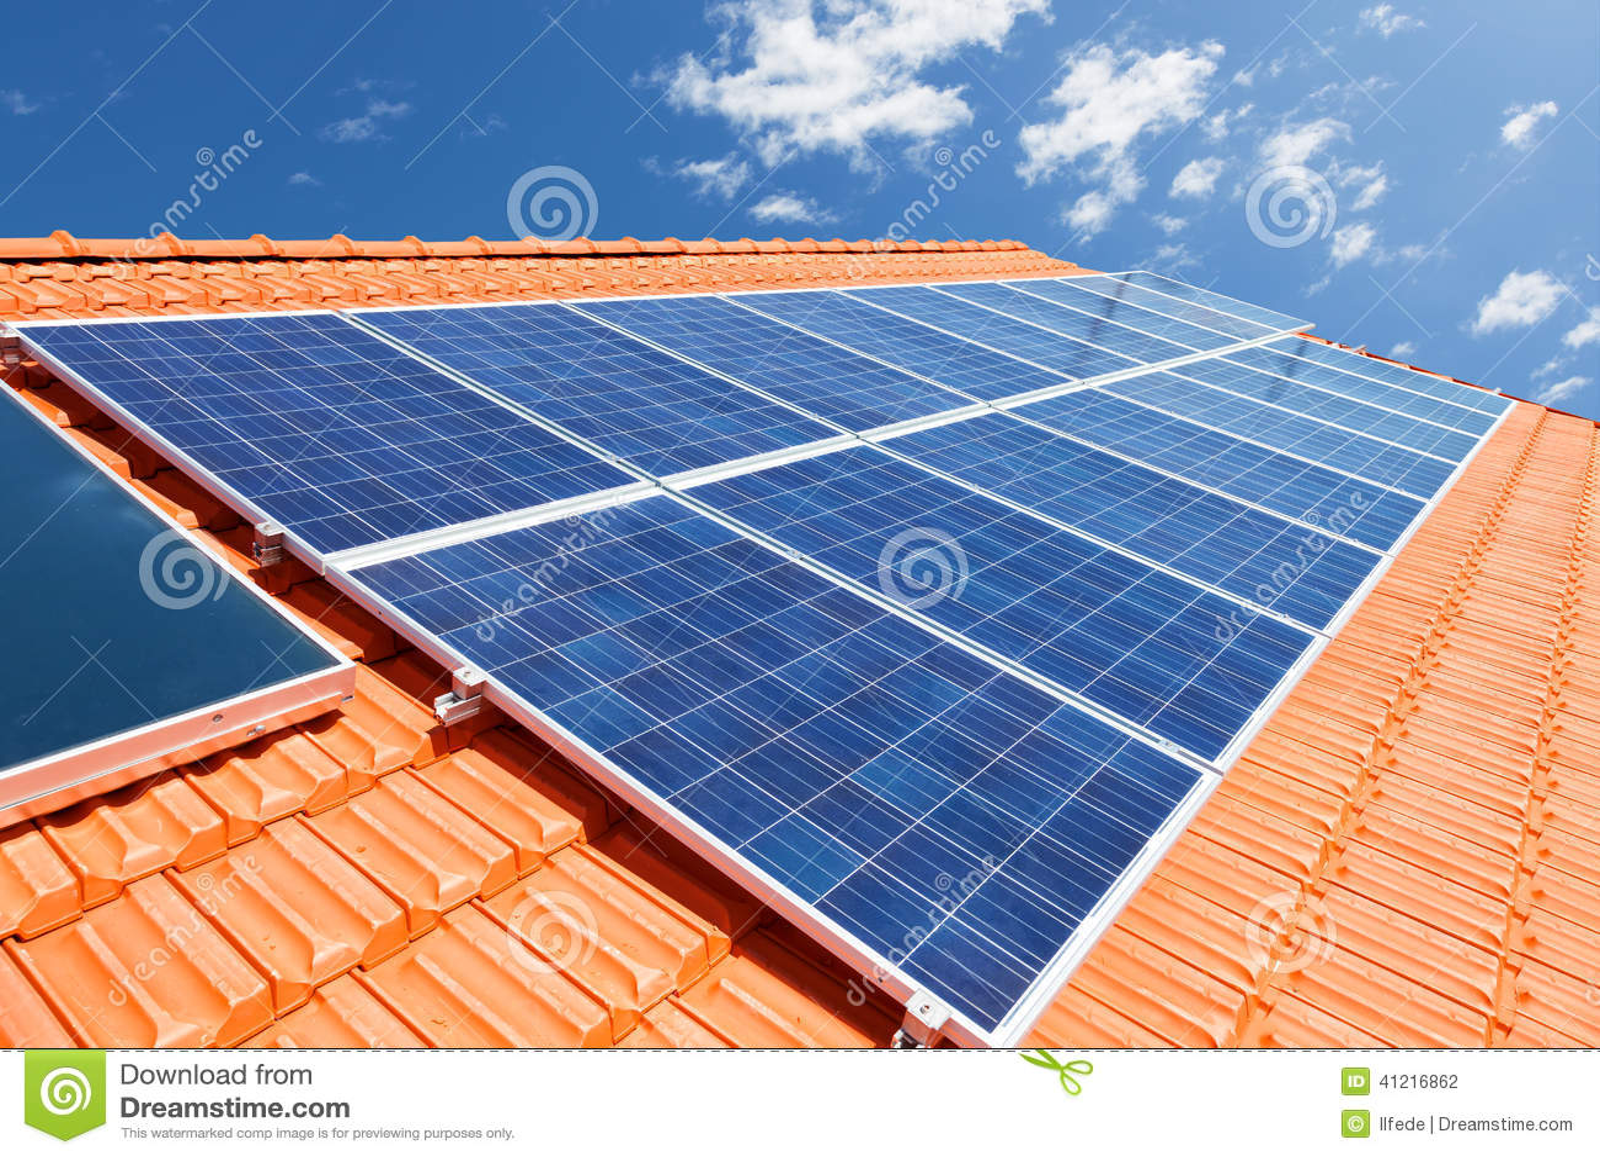 Solar Panels On Roof Stock Photo Image Of Blue Modern